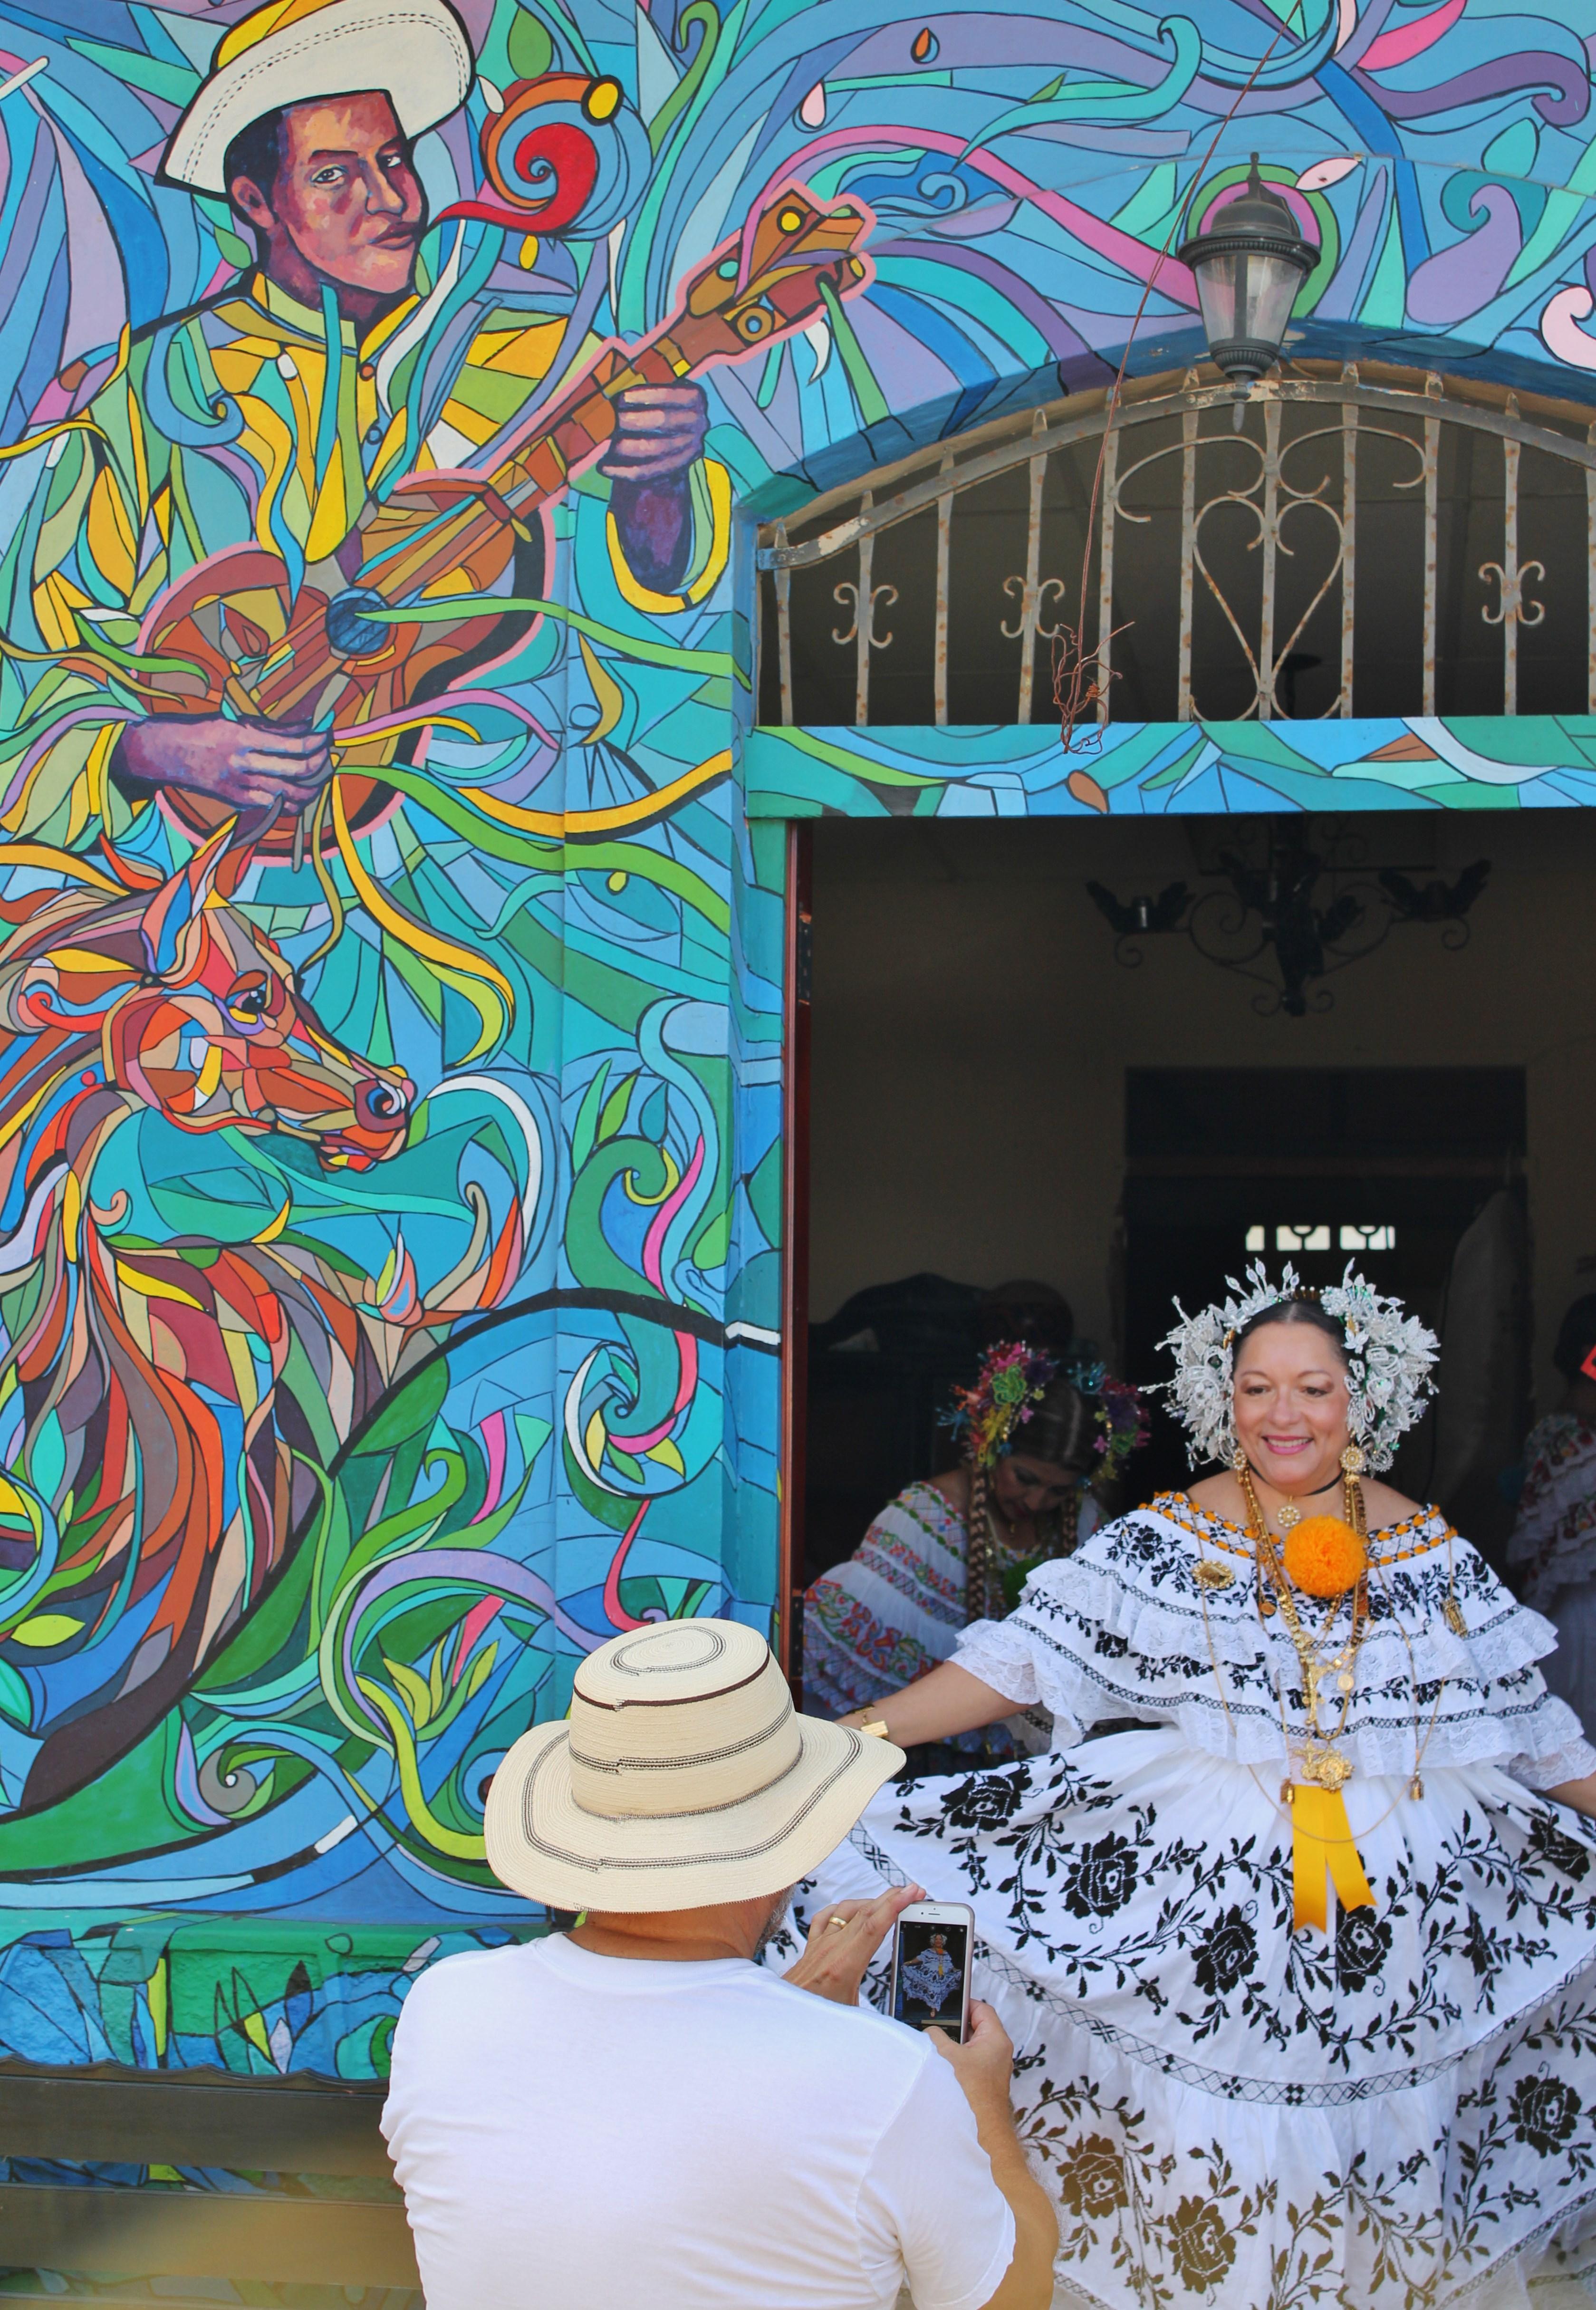 pollera-photo-opp A Panama Road Trip Panama Panama Fairs and Festivals